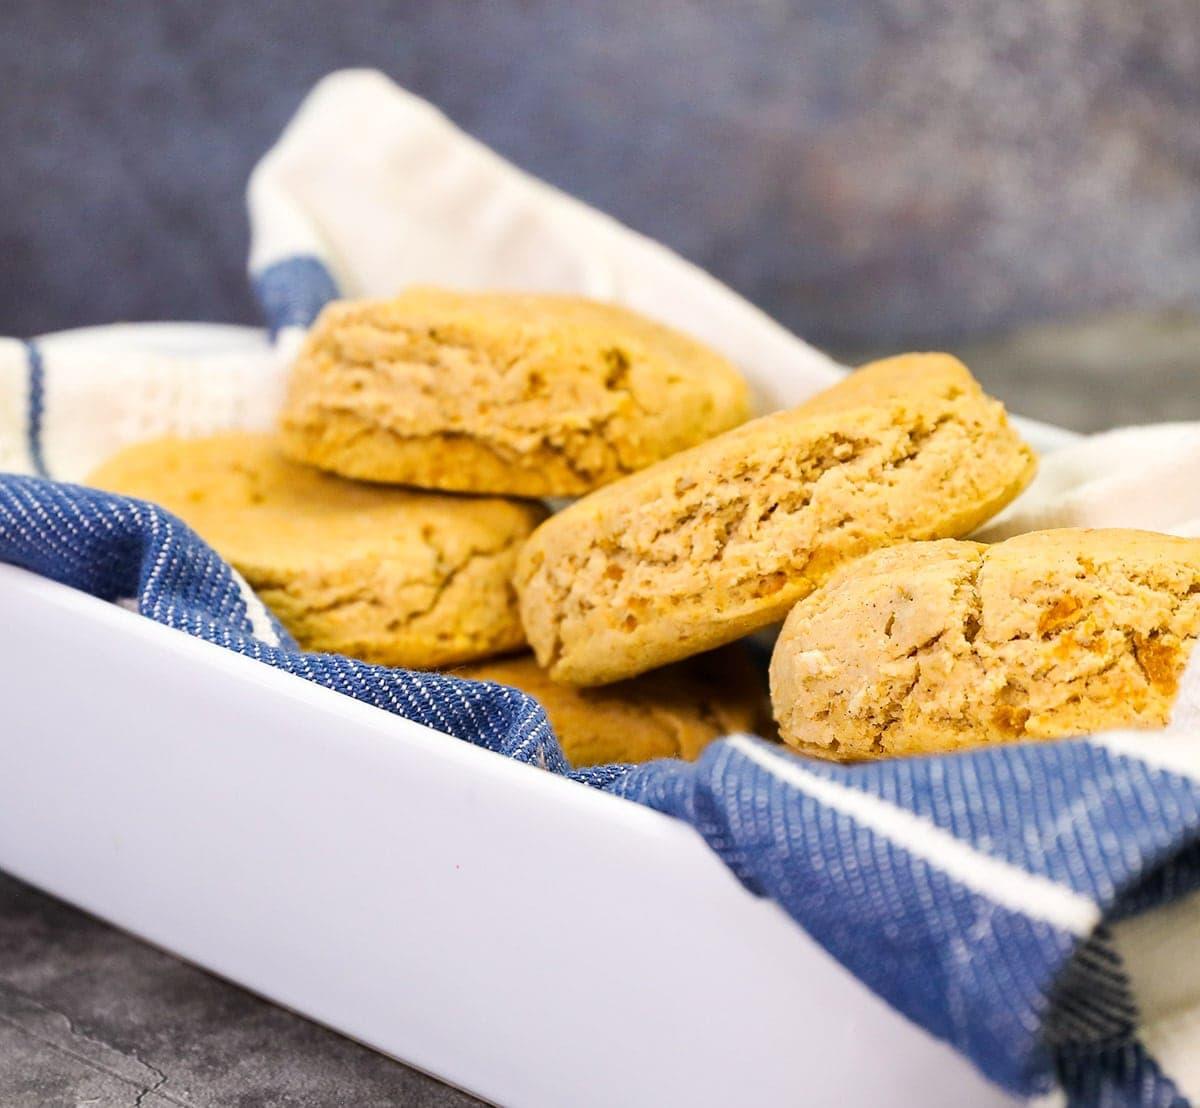 vegan sweet potato biscuit close up view